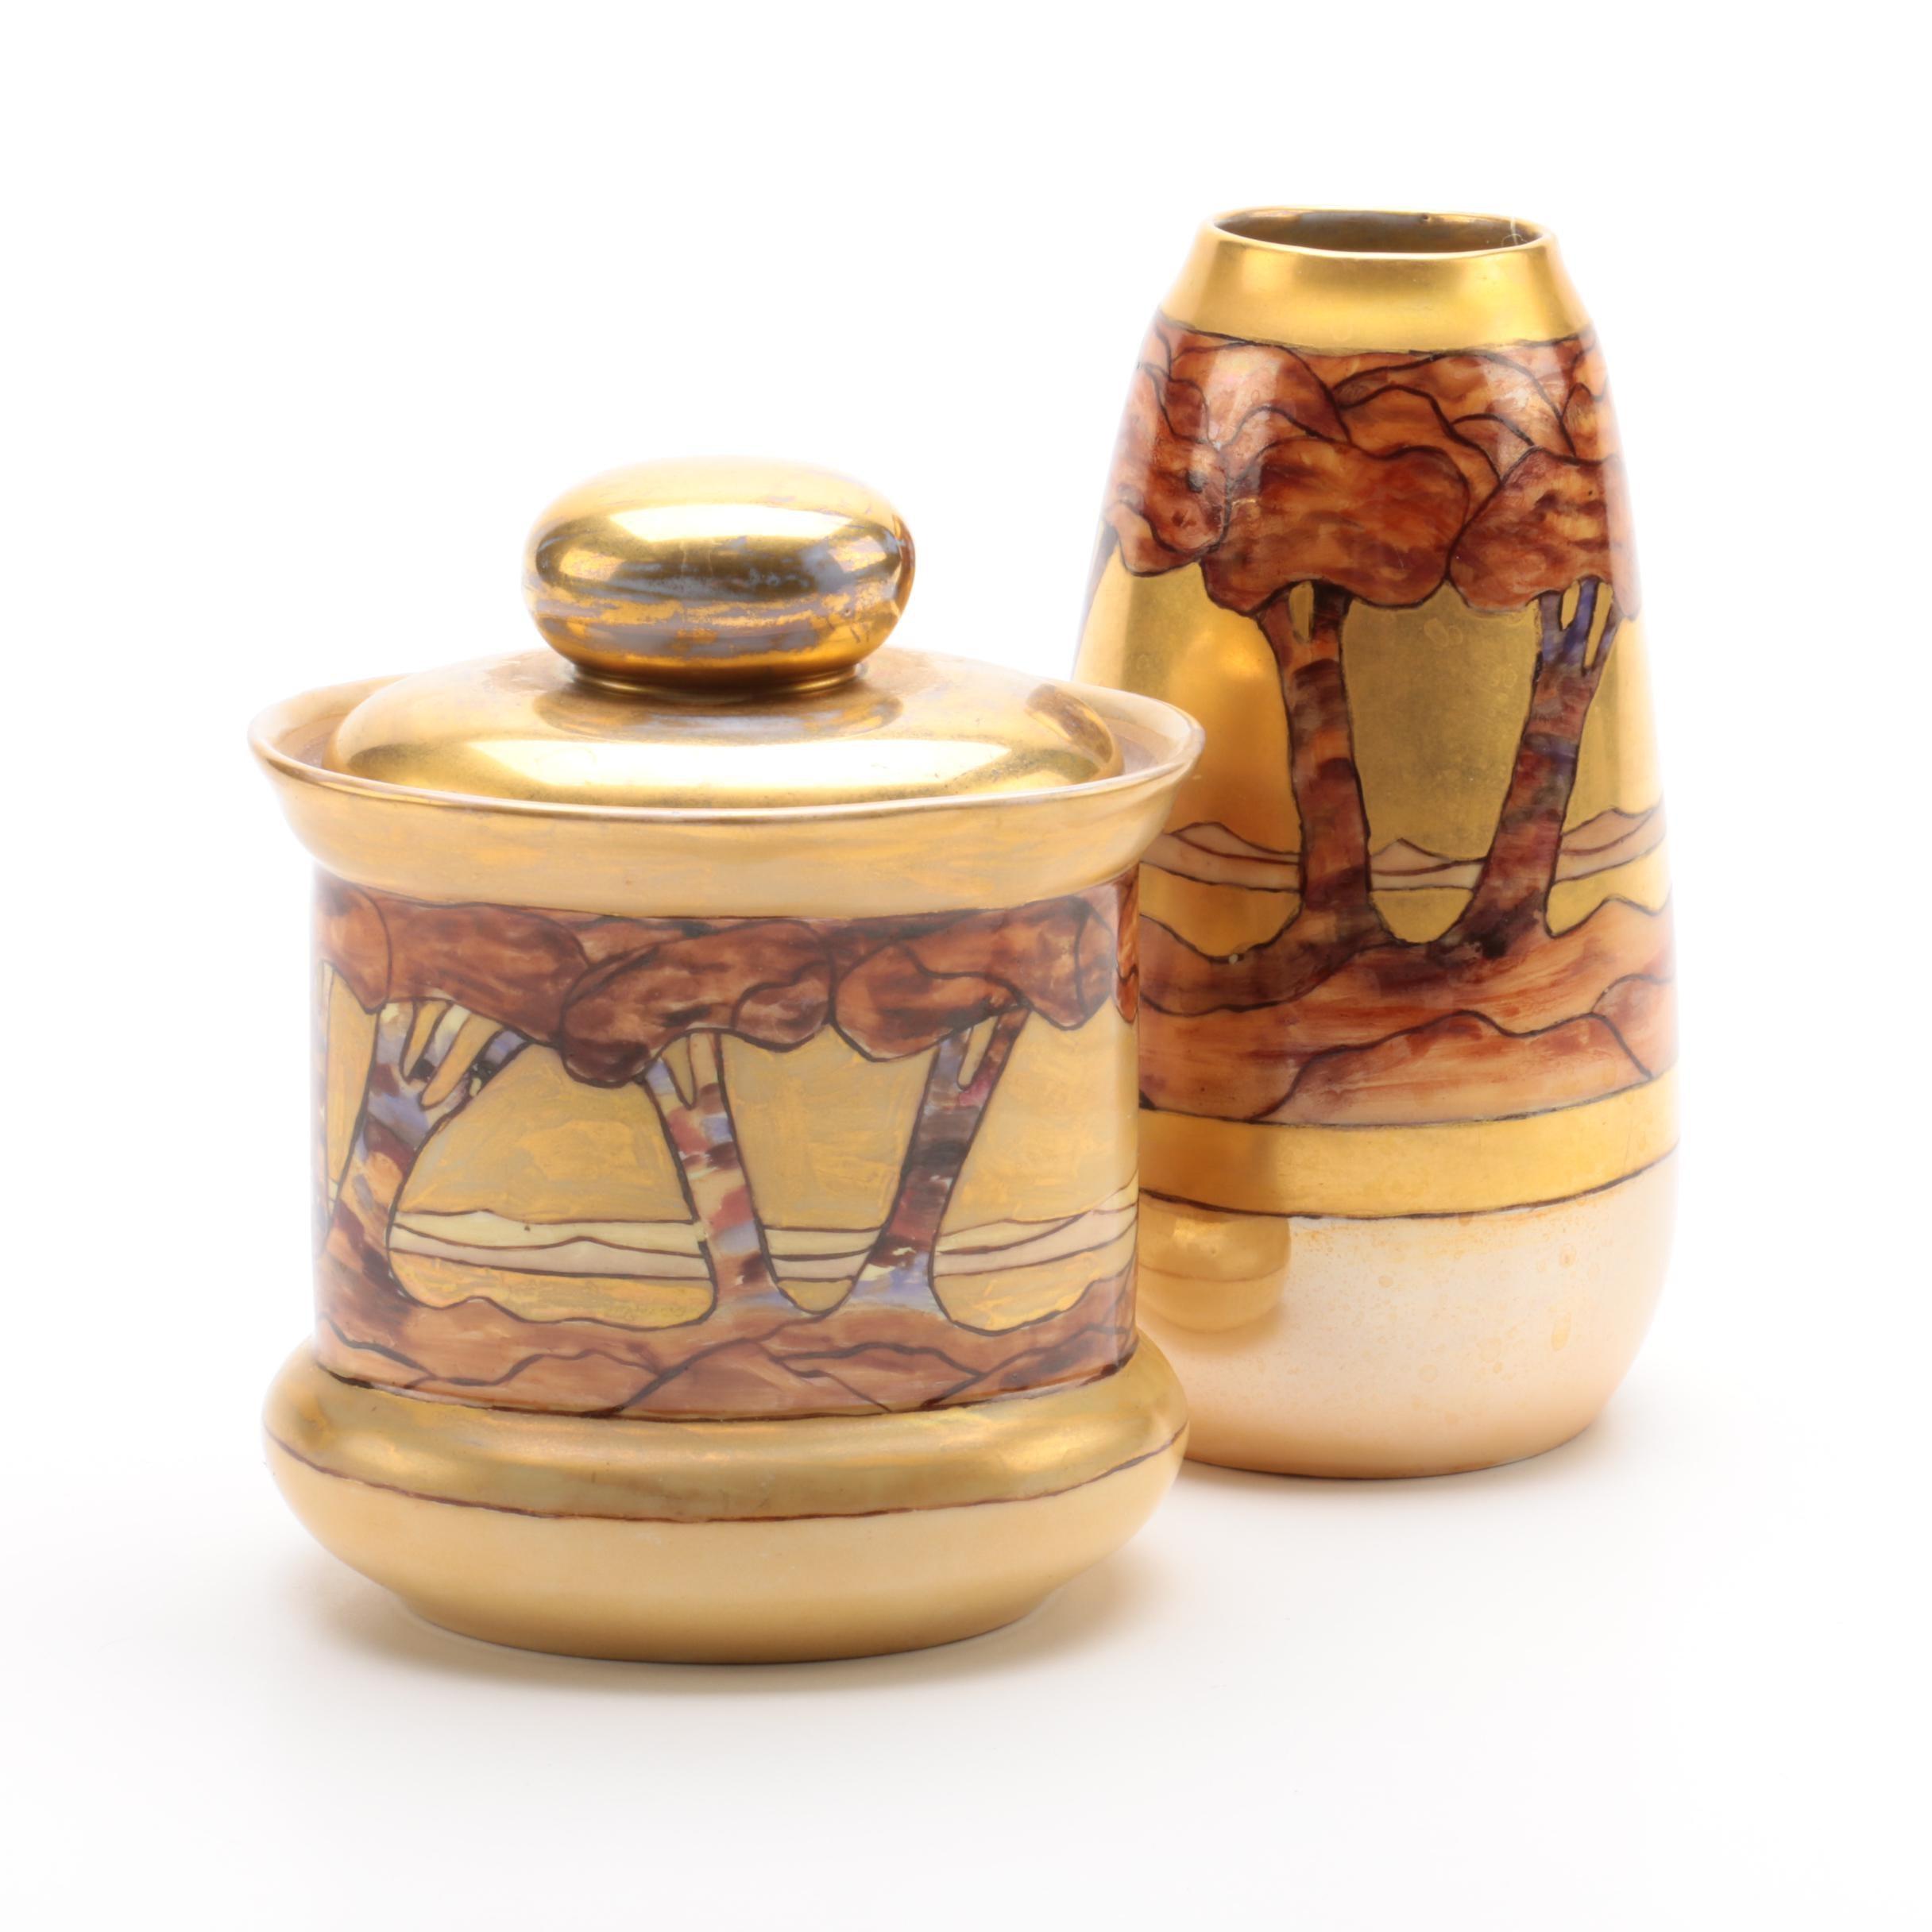 Antique Hobbyist Hand-Painted Vase and Dresser Jar